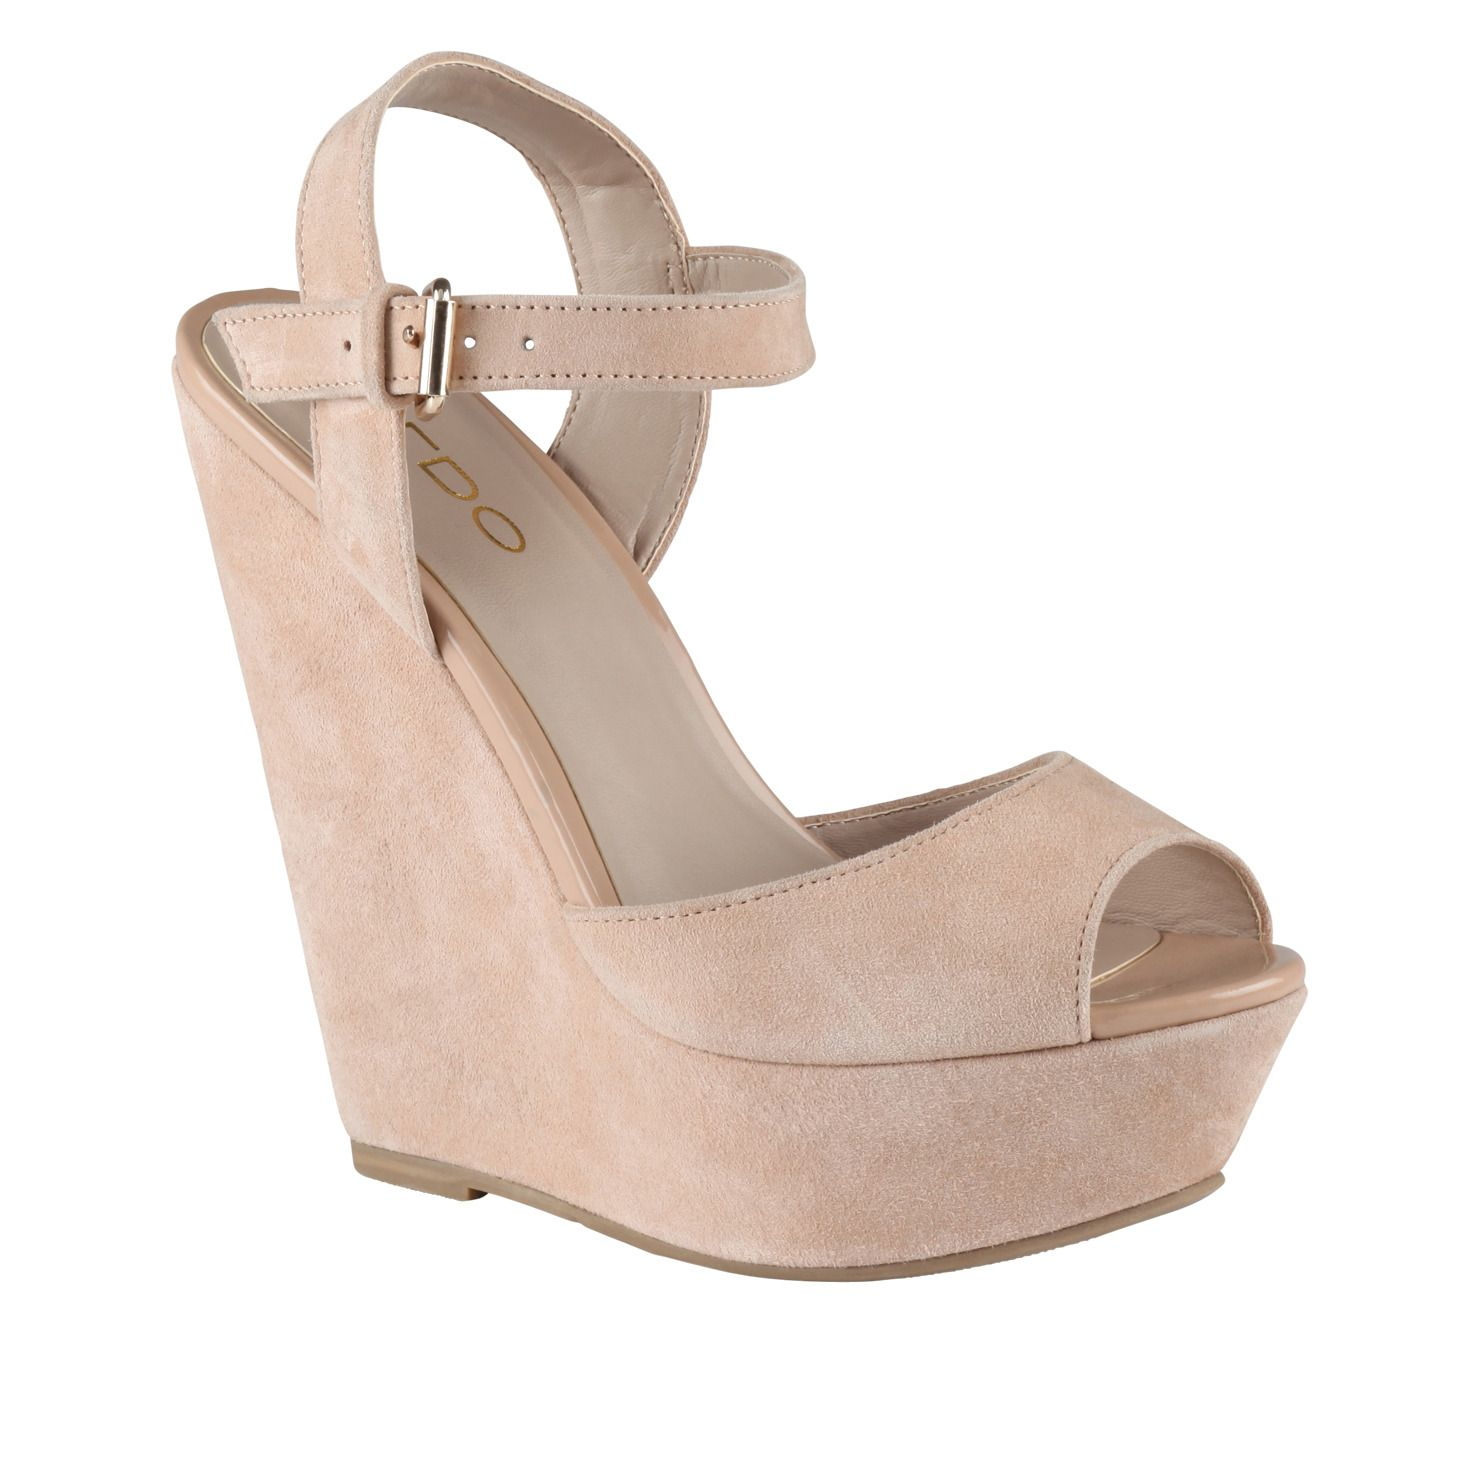 Womens sandals wedges - Cybil Women S Wedges Sandals For Sale At Aldo Shoes